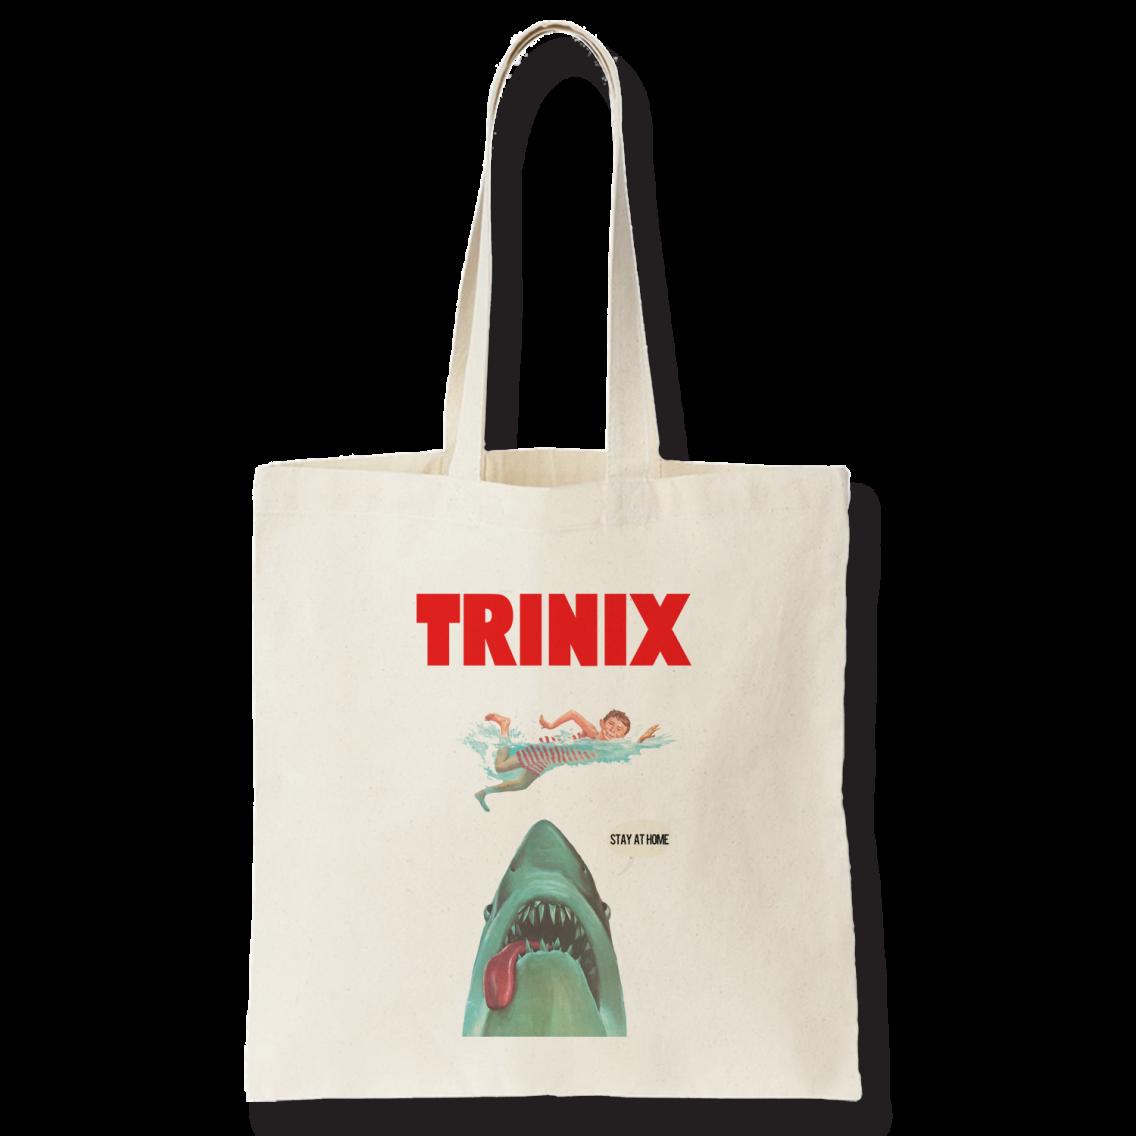 Trinix tote bag - Atelier du Quai